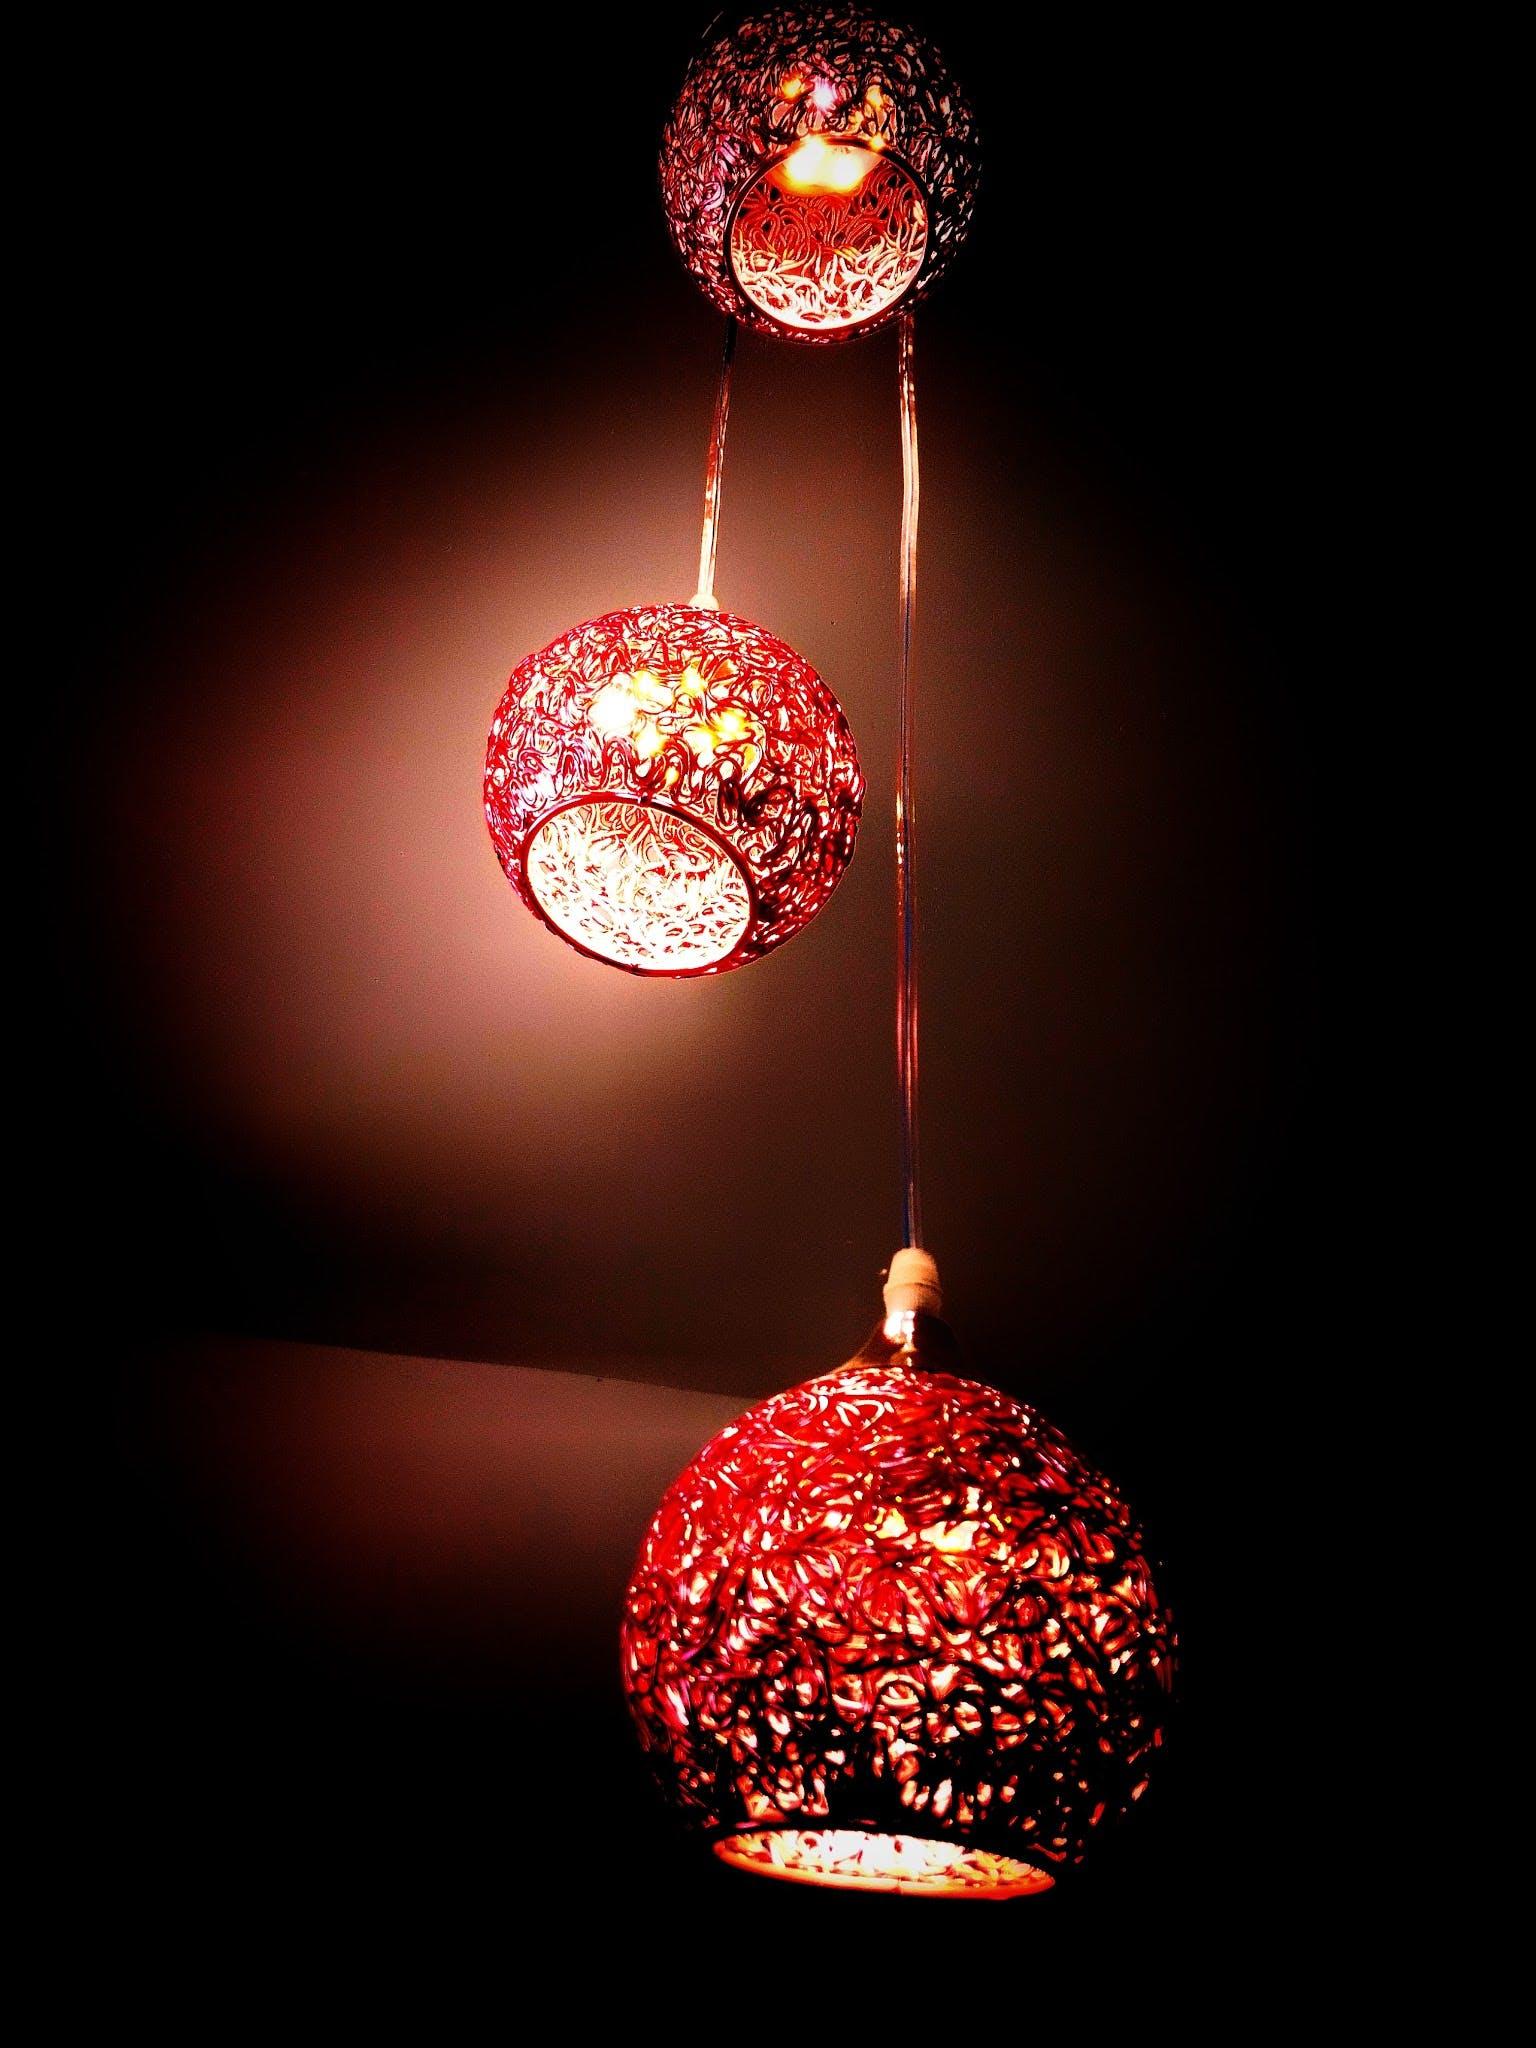 Lighted Red Hanging Lantern